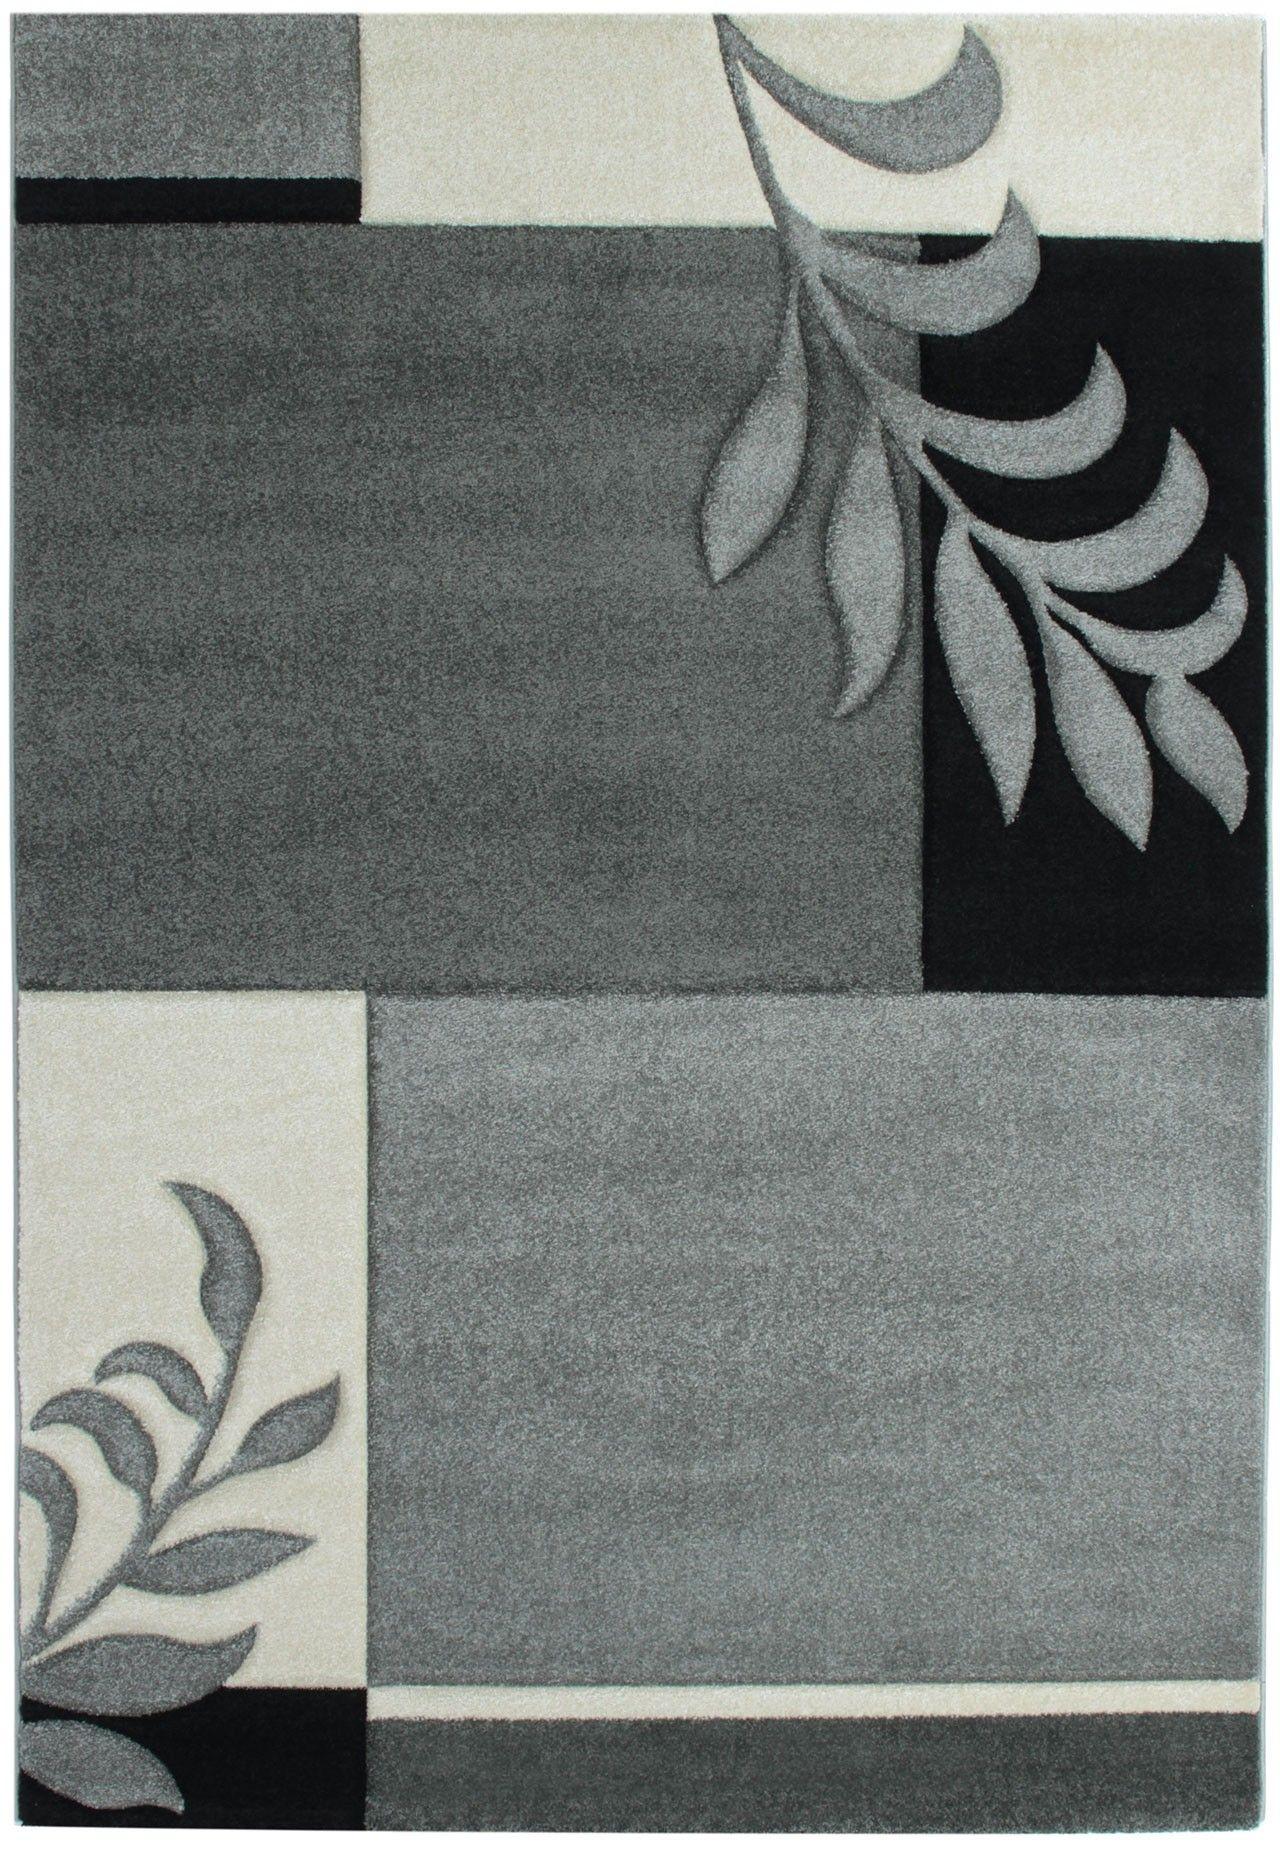 Florida 930 Grau Teppich Carpet Modern Grau Beige Braun Weiss Style Einfach